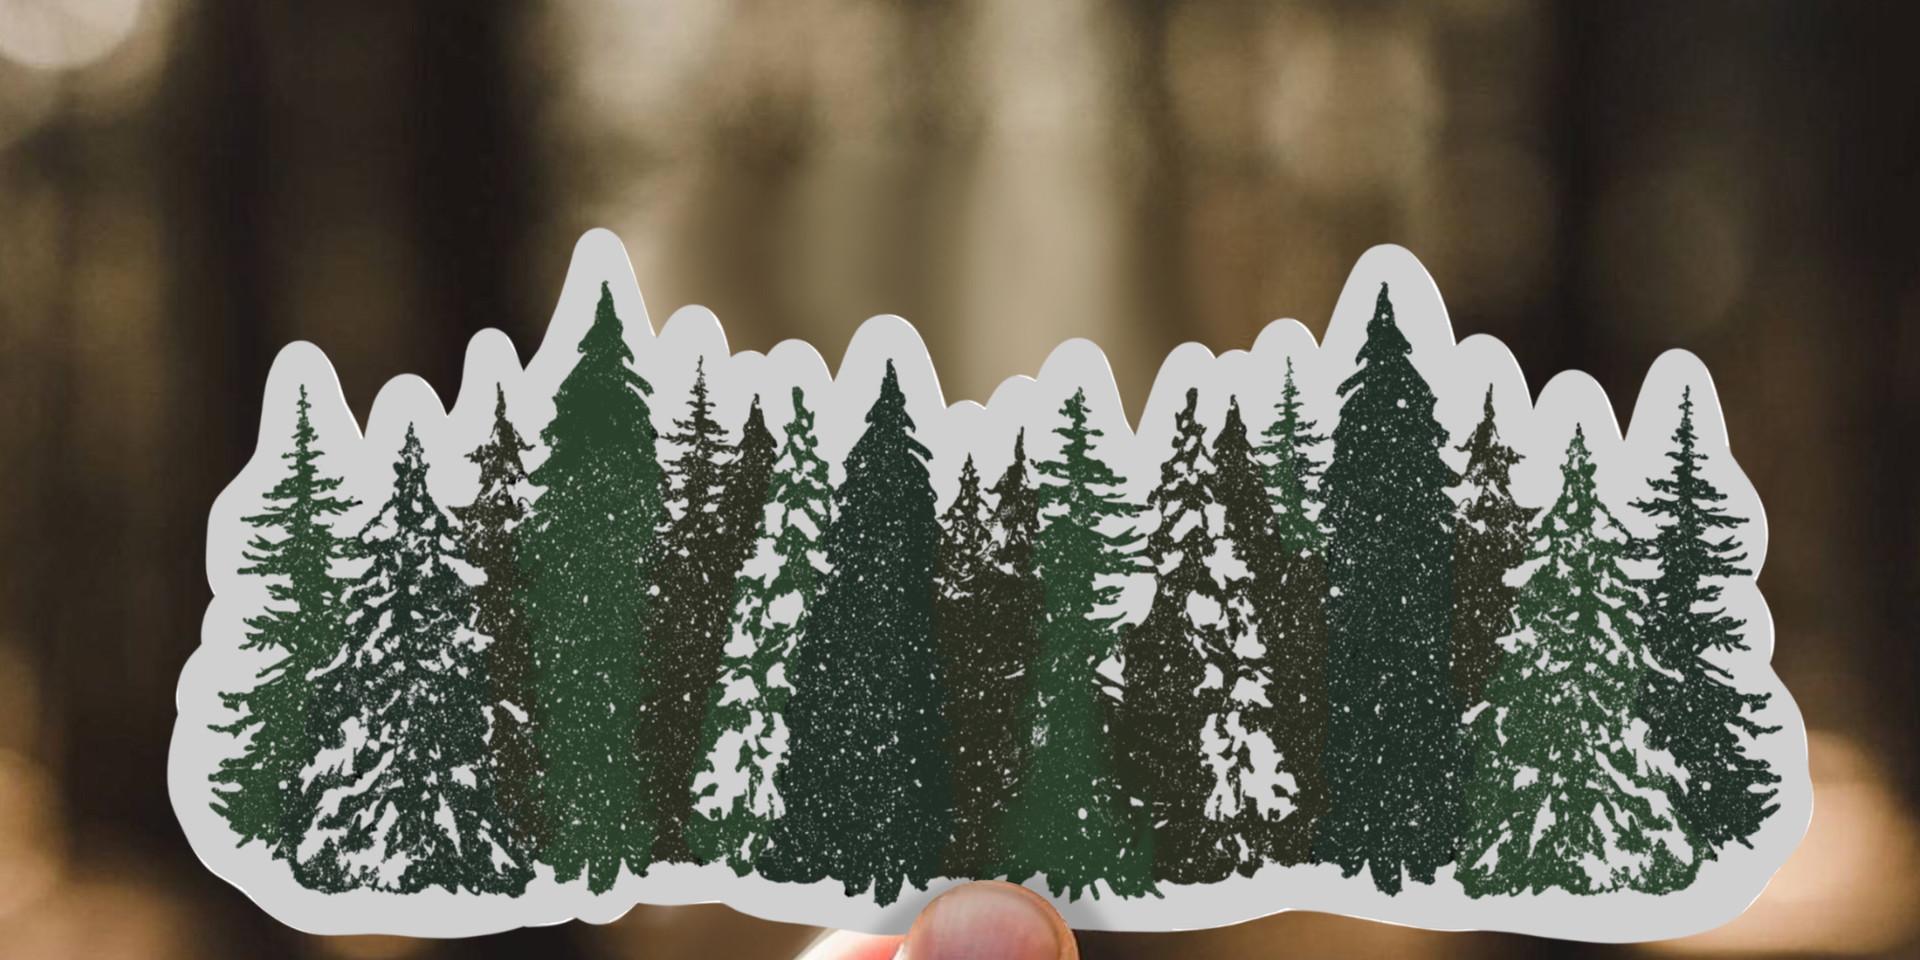 Row of Pines Sticker